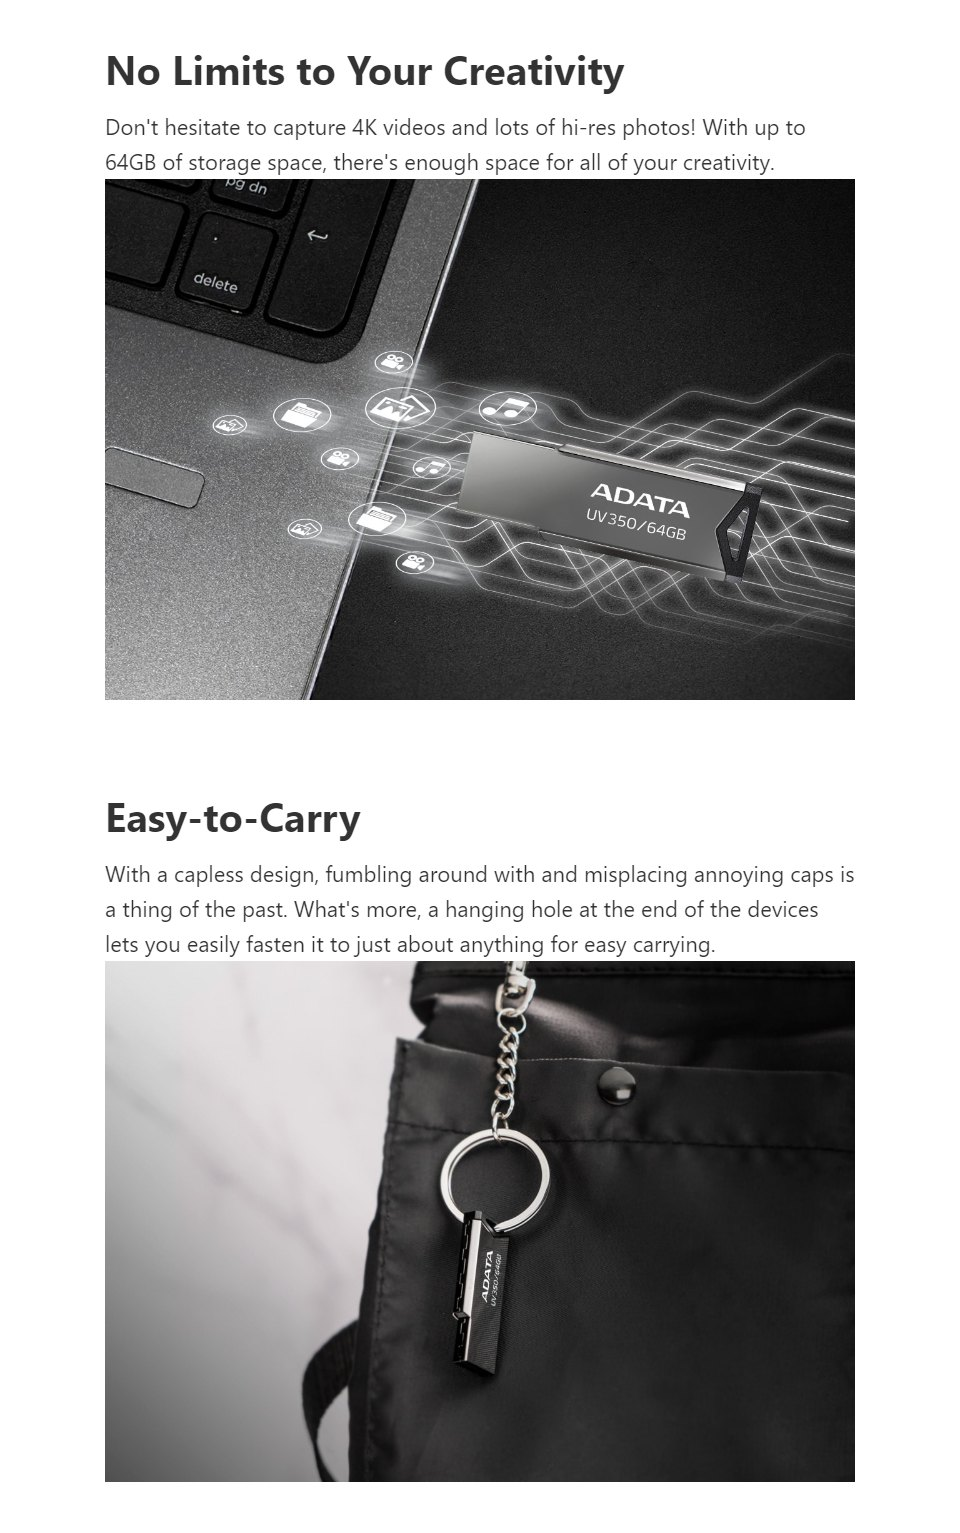 ADATA UV350 USB 3.2 Flash Drive 64GB features 2